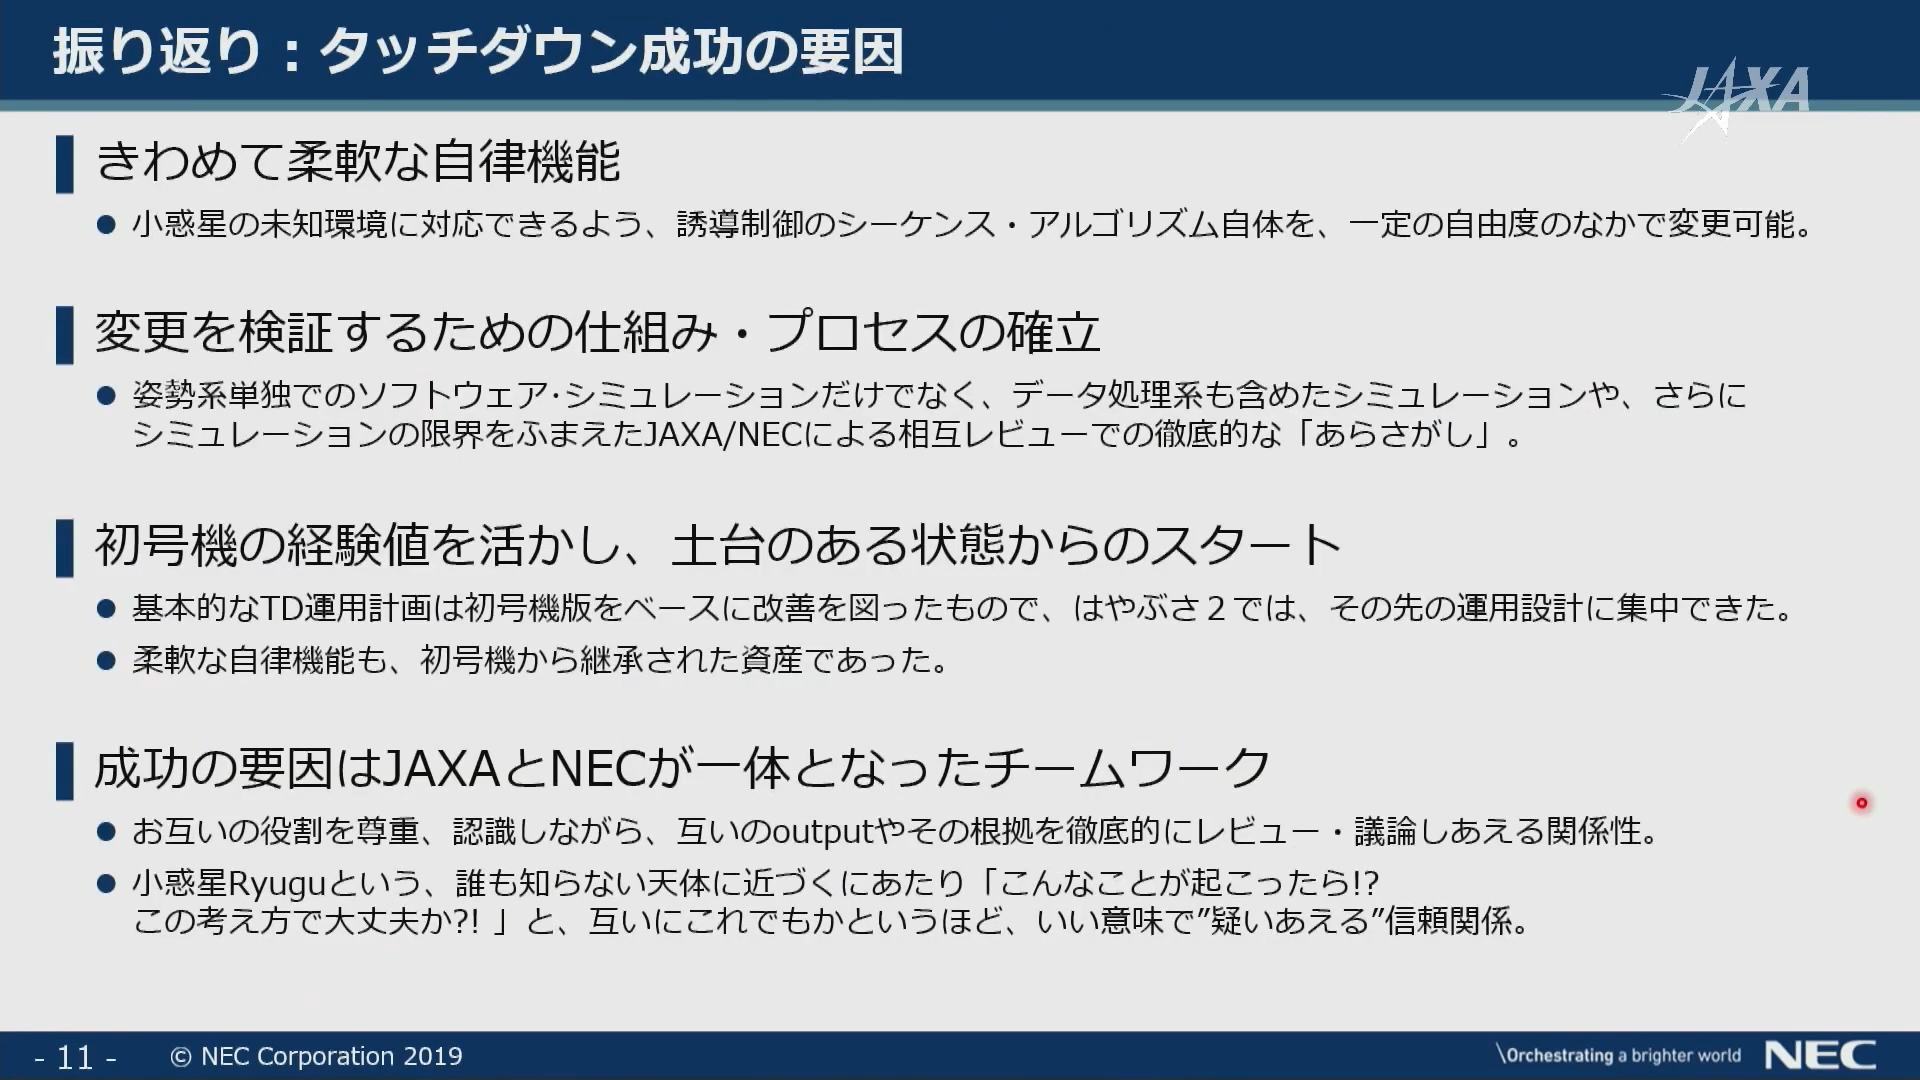 f:id:Imamura:20191219211850p:plain